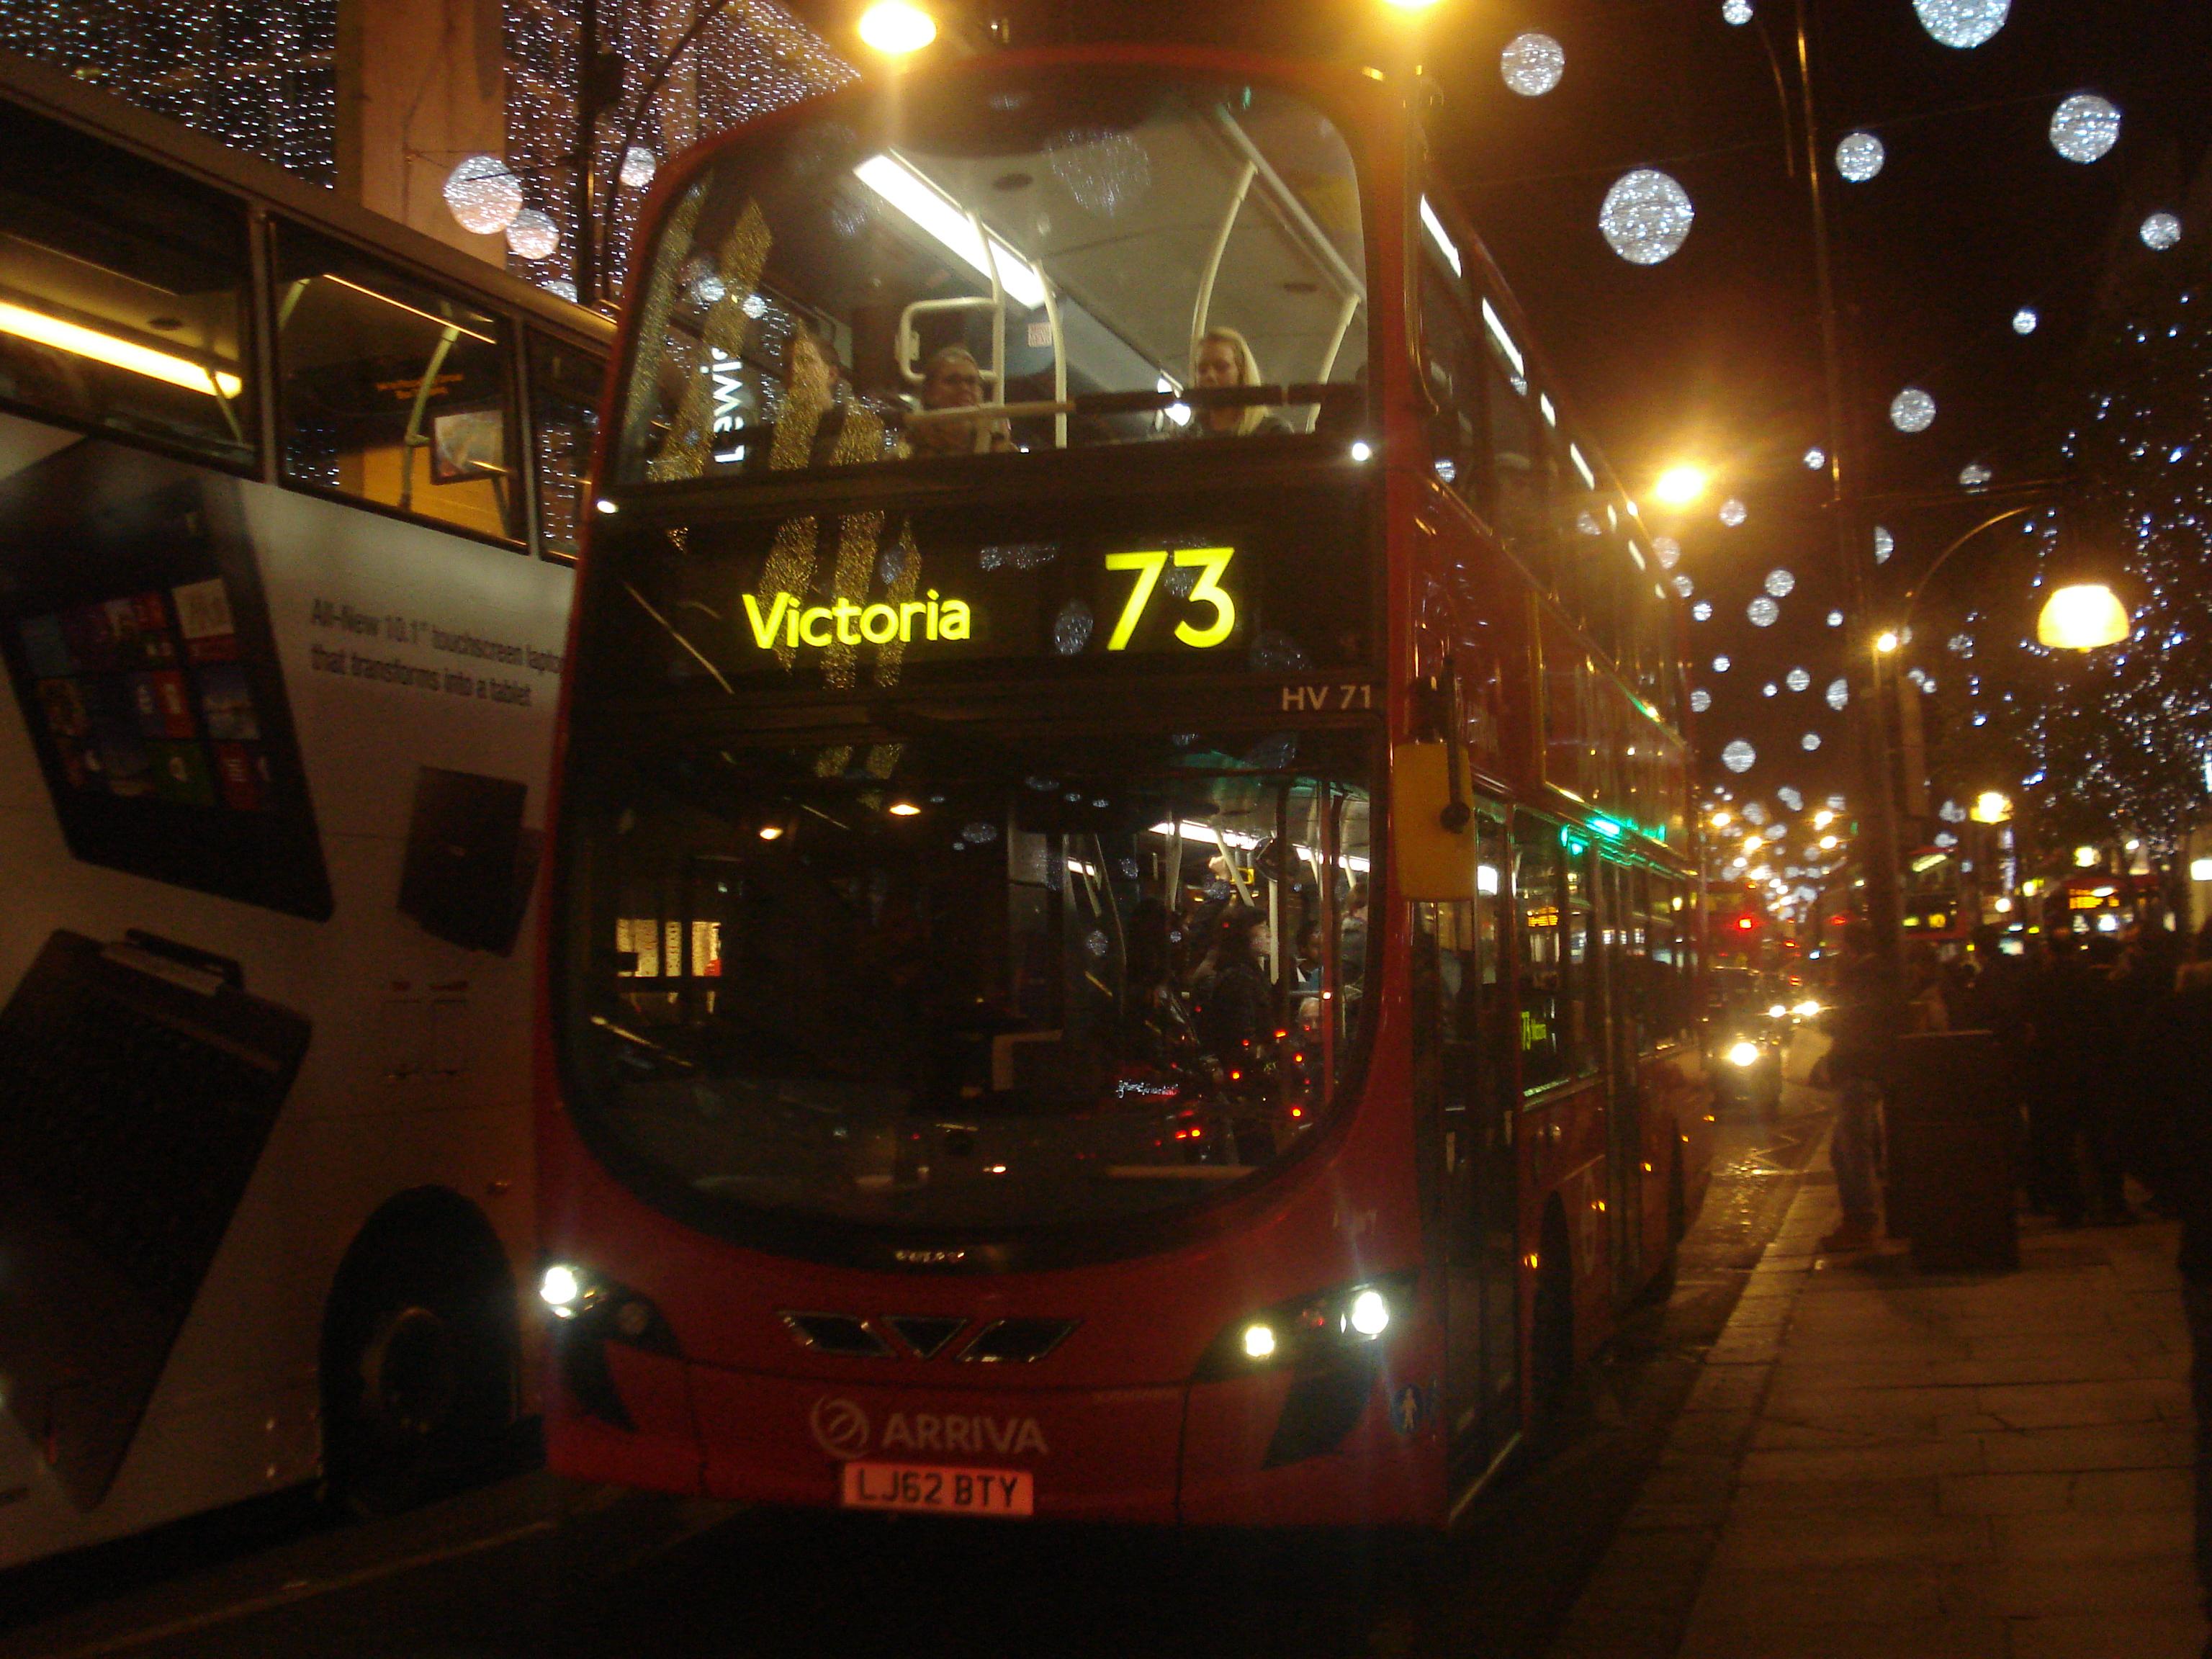 File:Au Morandarte Flickr Arriva HV71 on Route 73, Oxford Street ...